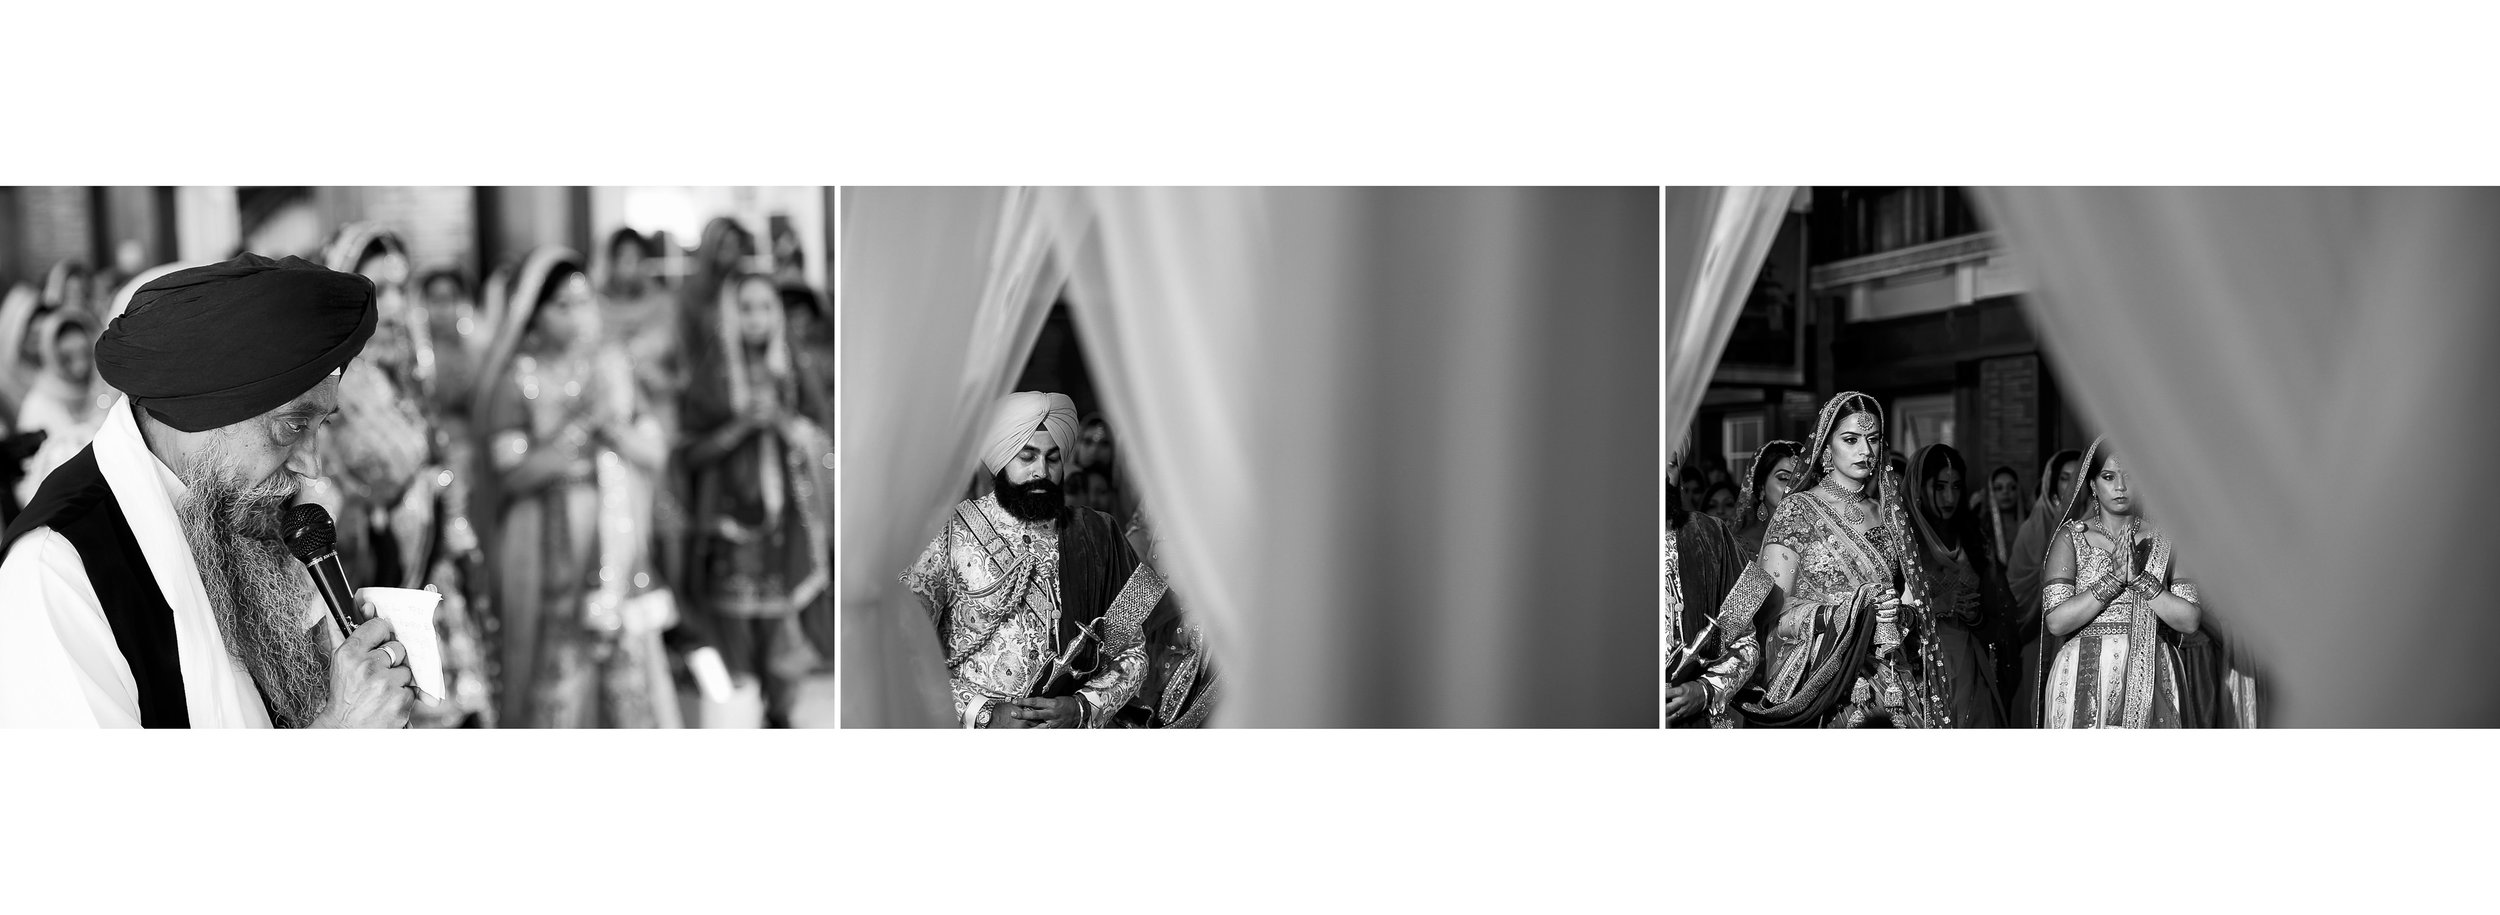 Sikh Wedding - Jaspreet and Indy-36.jpg